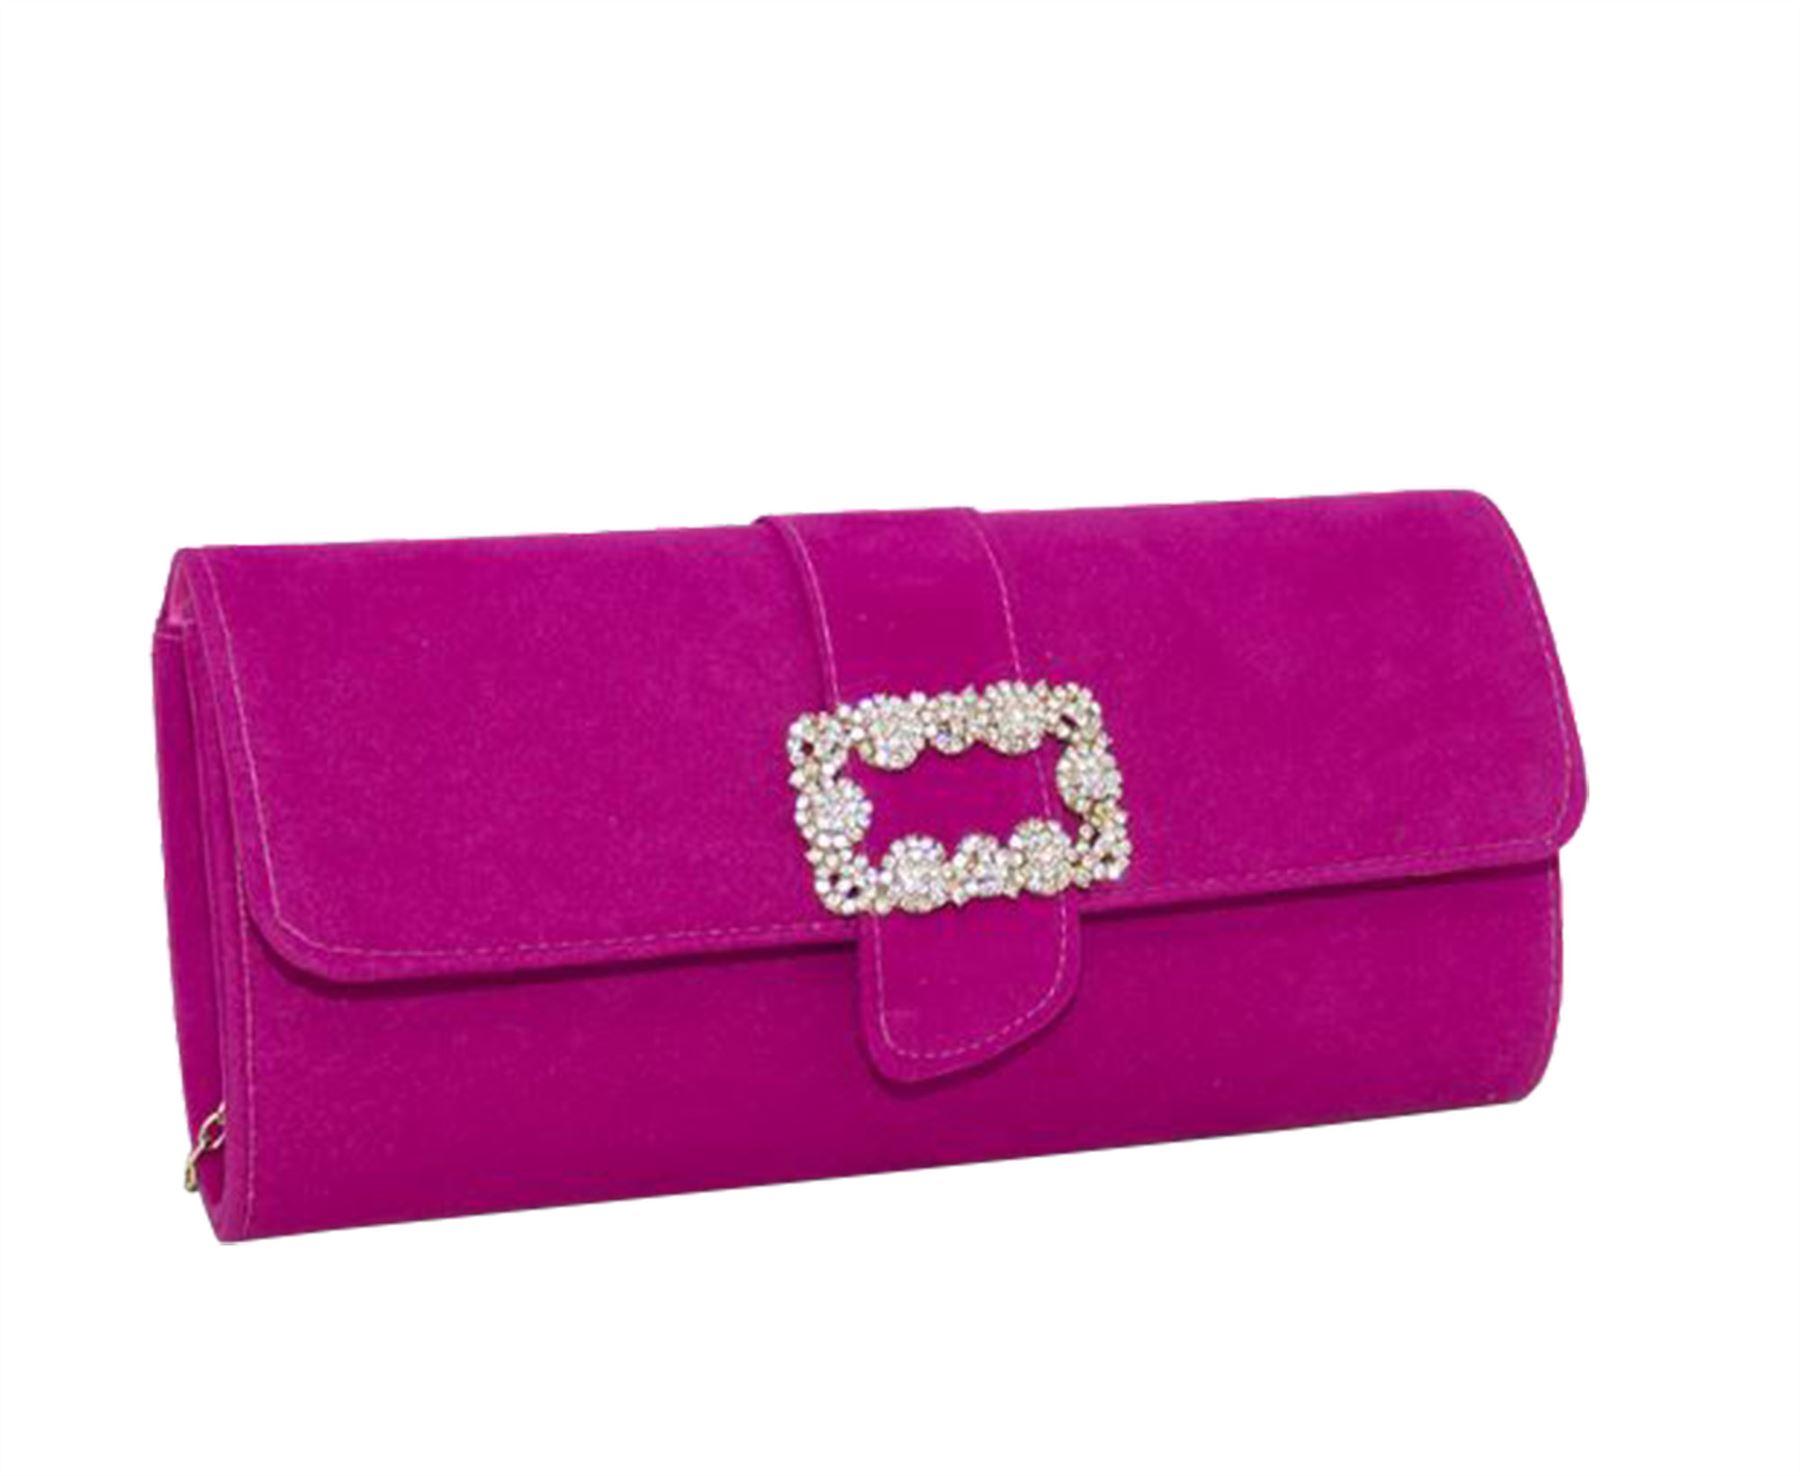 New Diamante Buckle Detail Women's Evening Velvet Clutch Bag Purse